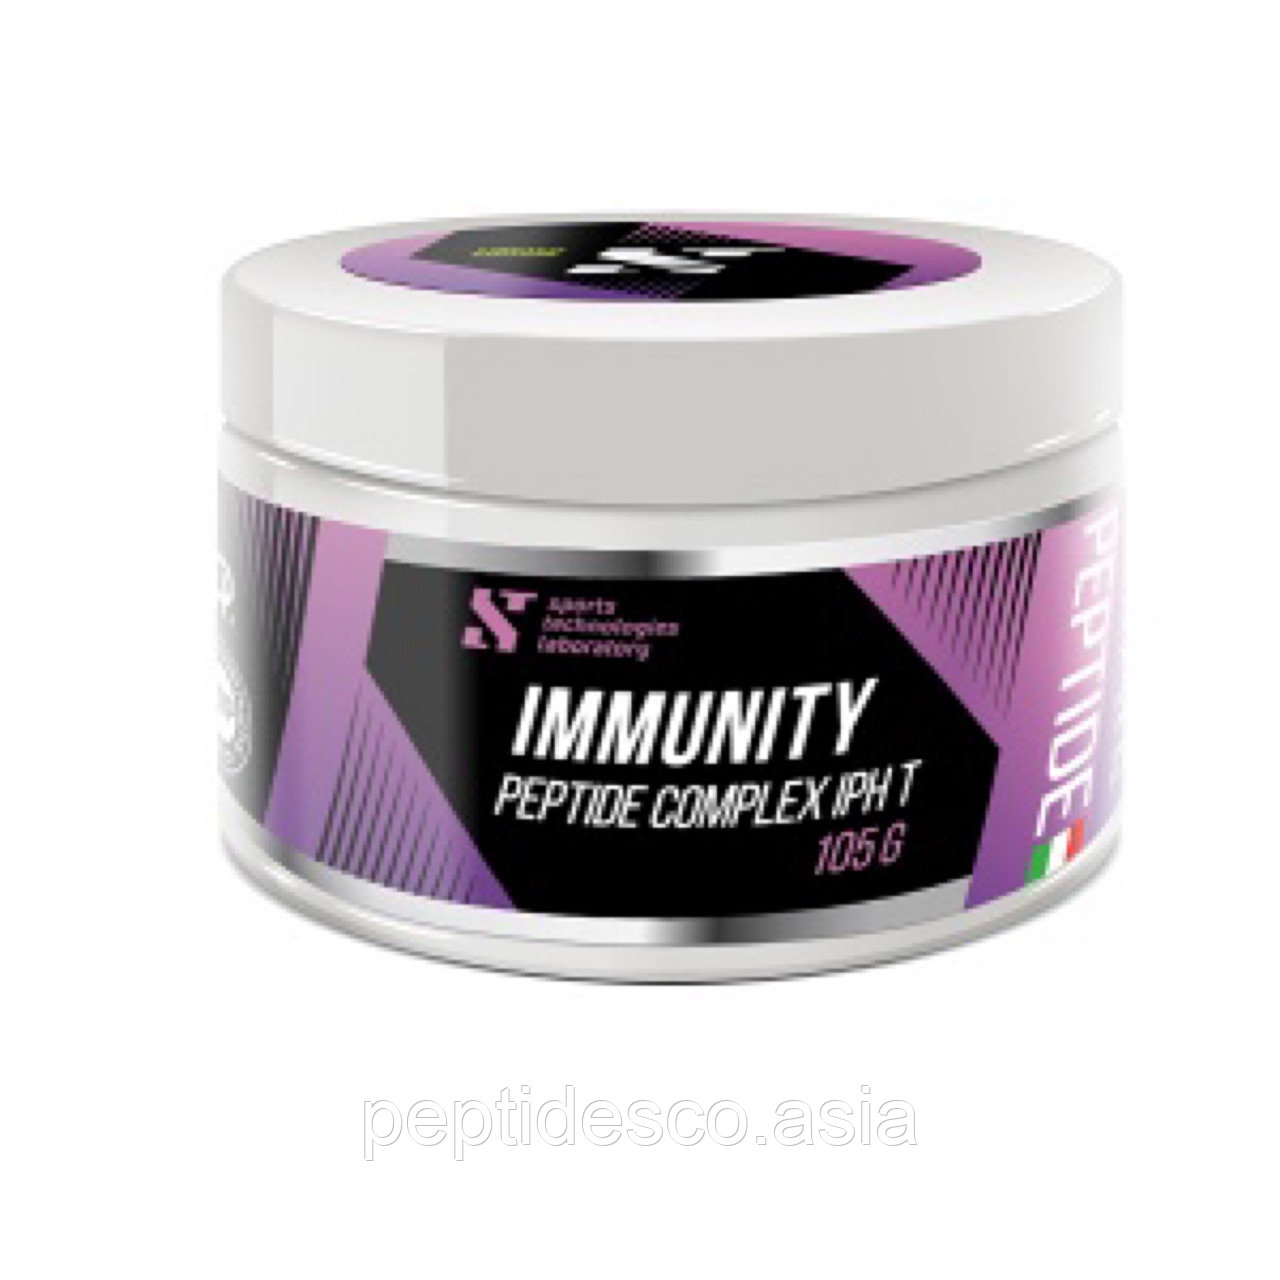 Immunity Peptide Complex IPH T иммунный пептидный комплекс, 105 г